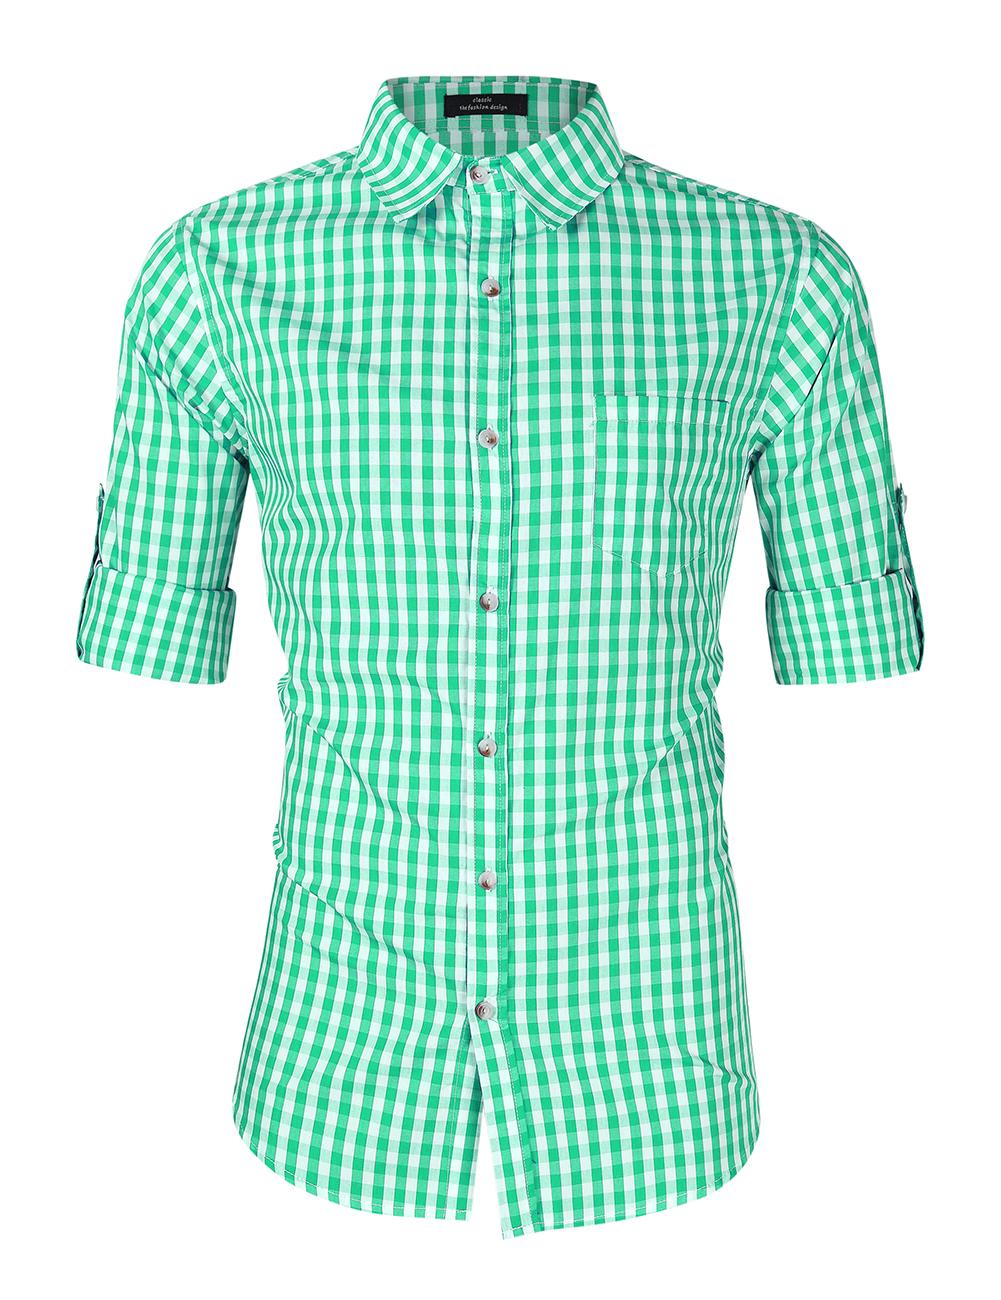 [EU Direct] Men's Oktoberfest Costumes Long Sleeve Shirt Fashion Plaid Front Pocket Classical Shirt Tops